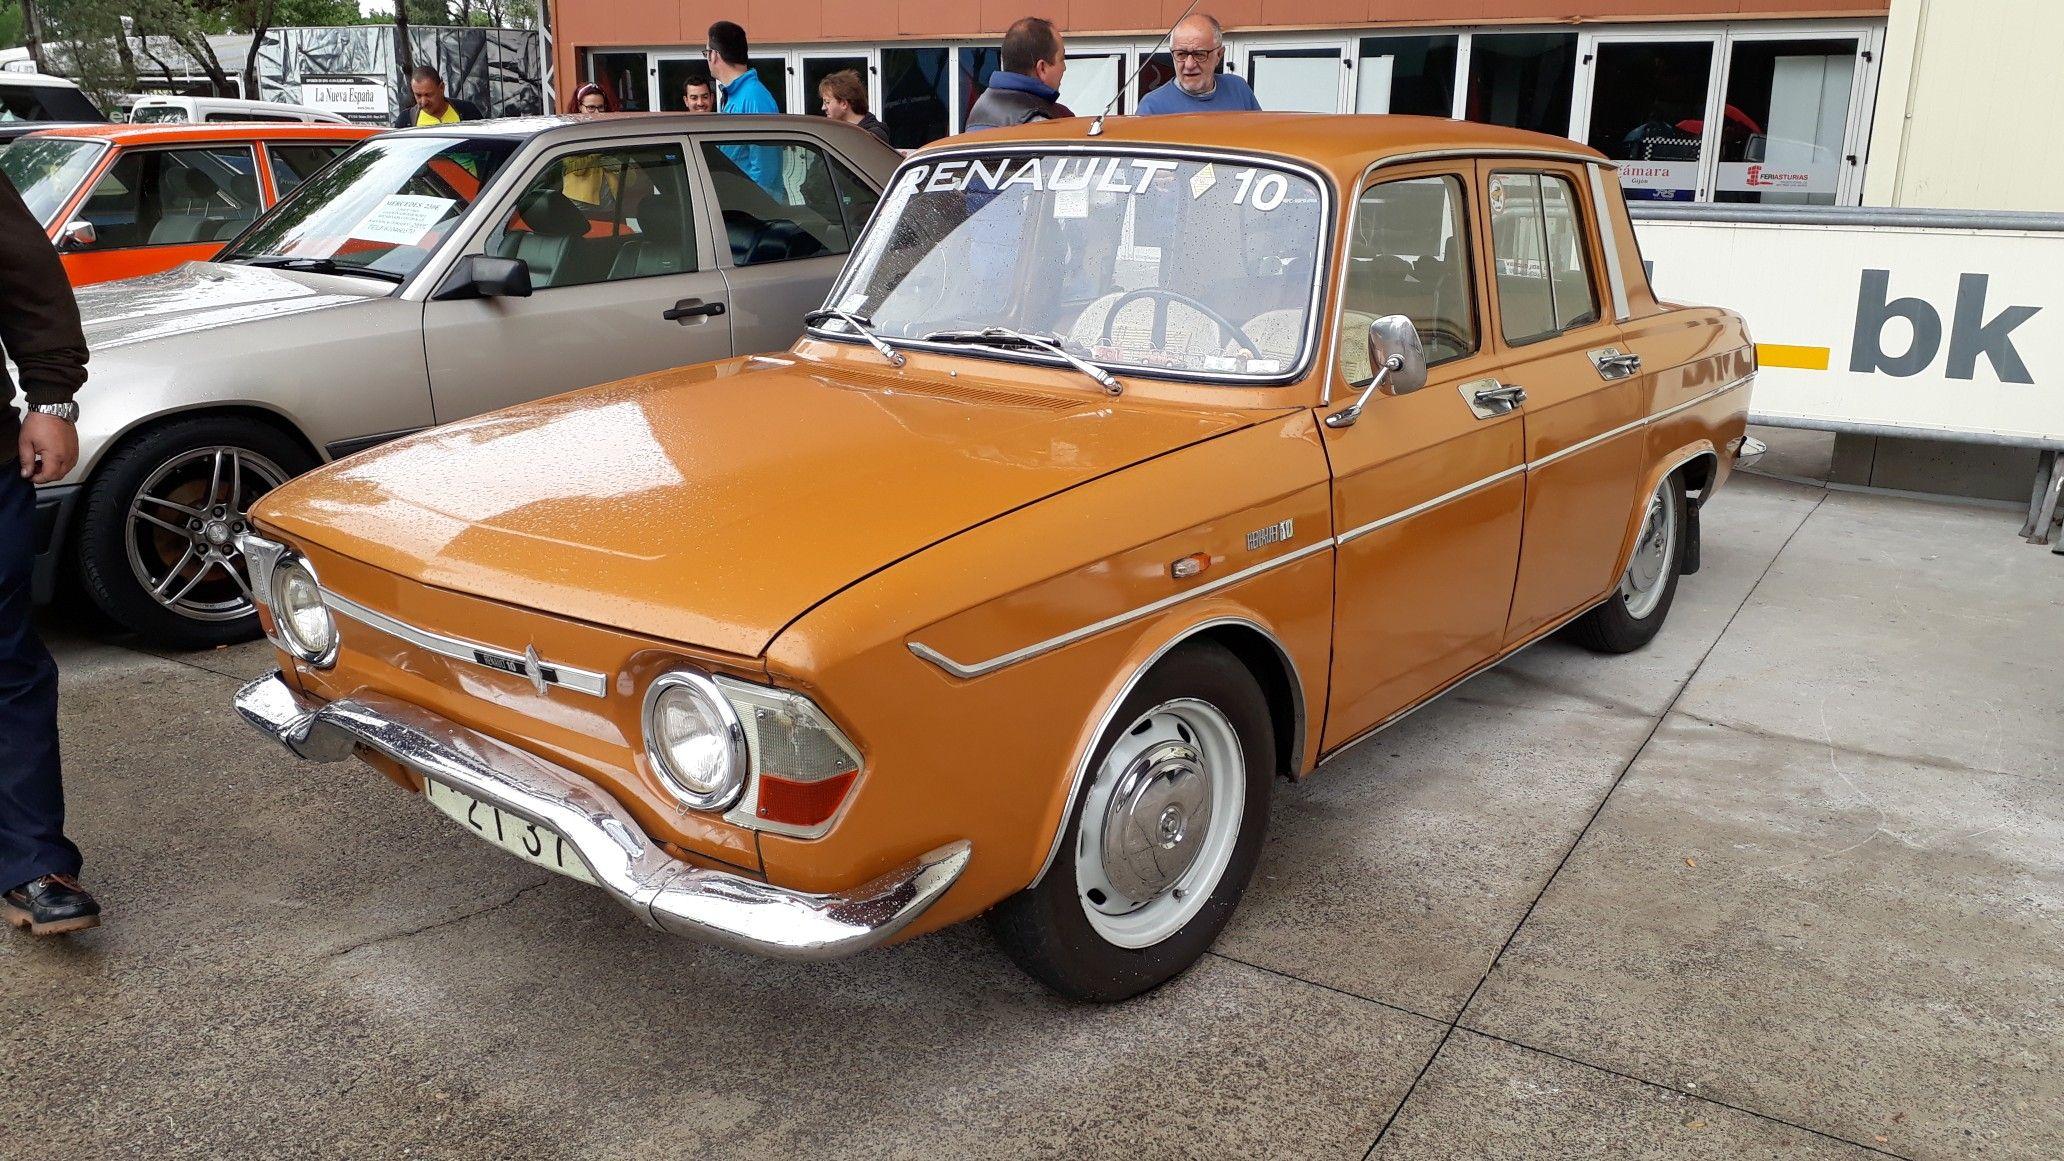 Renault 10 Auto Oldtimers